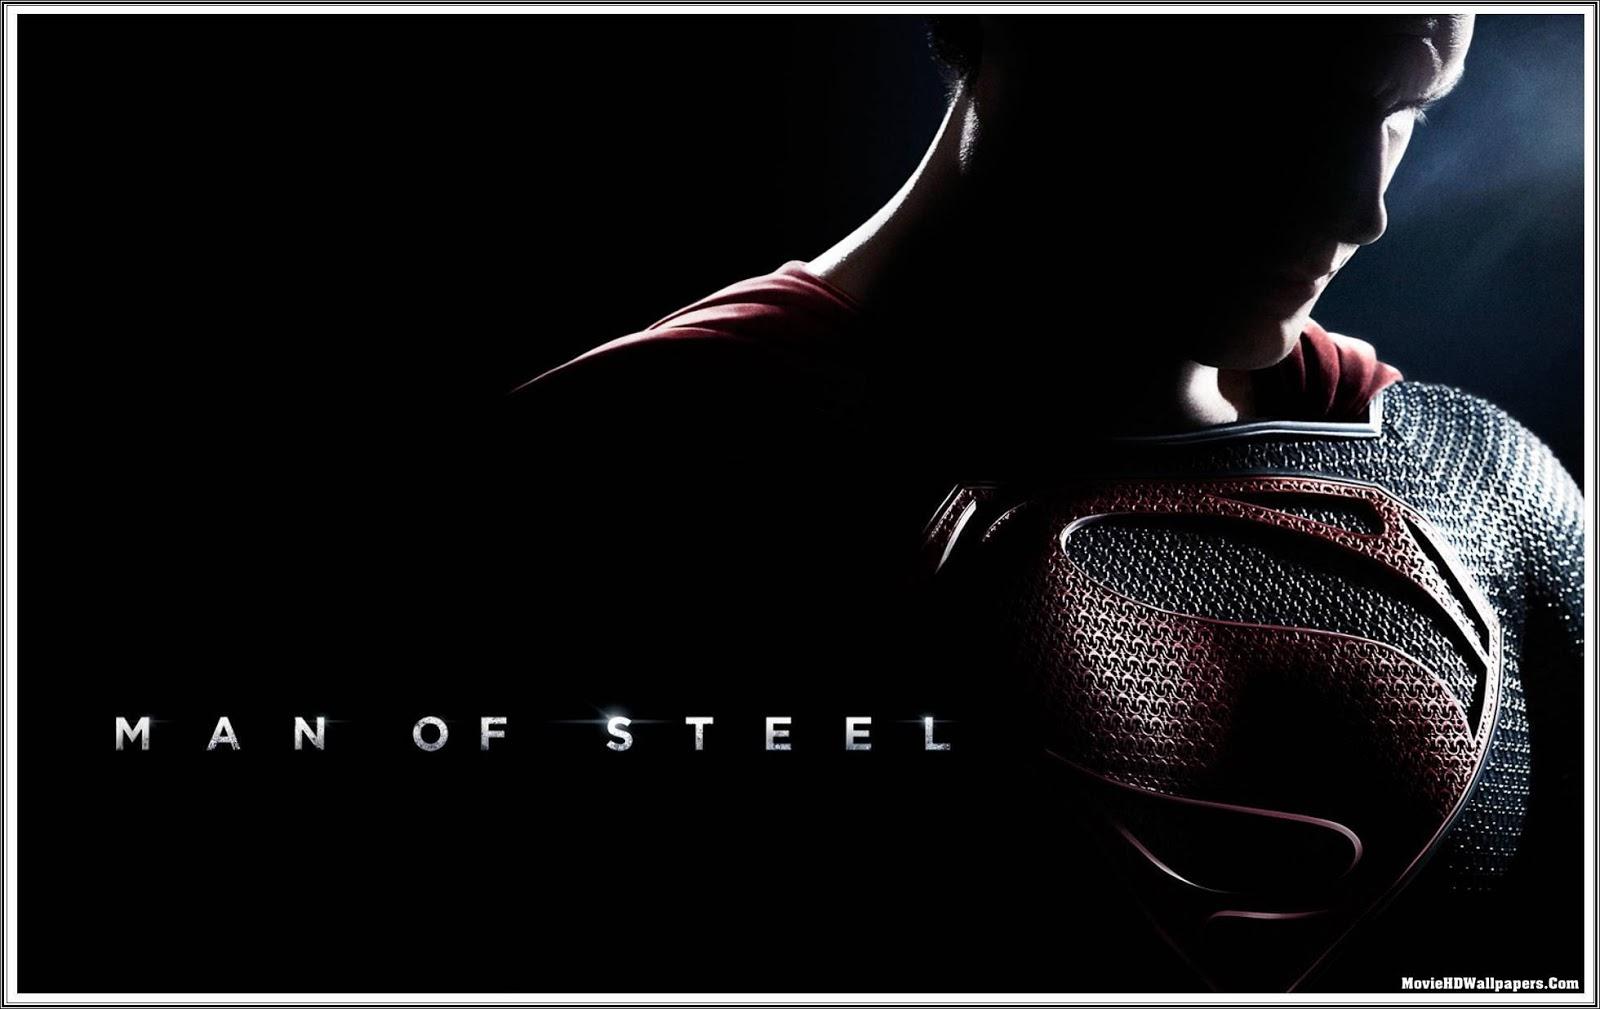 man of steel hd wallpaper,batman,fictional character